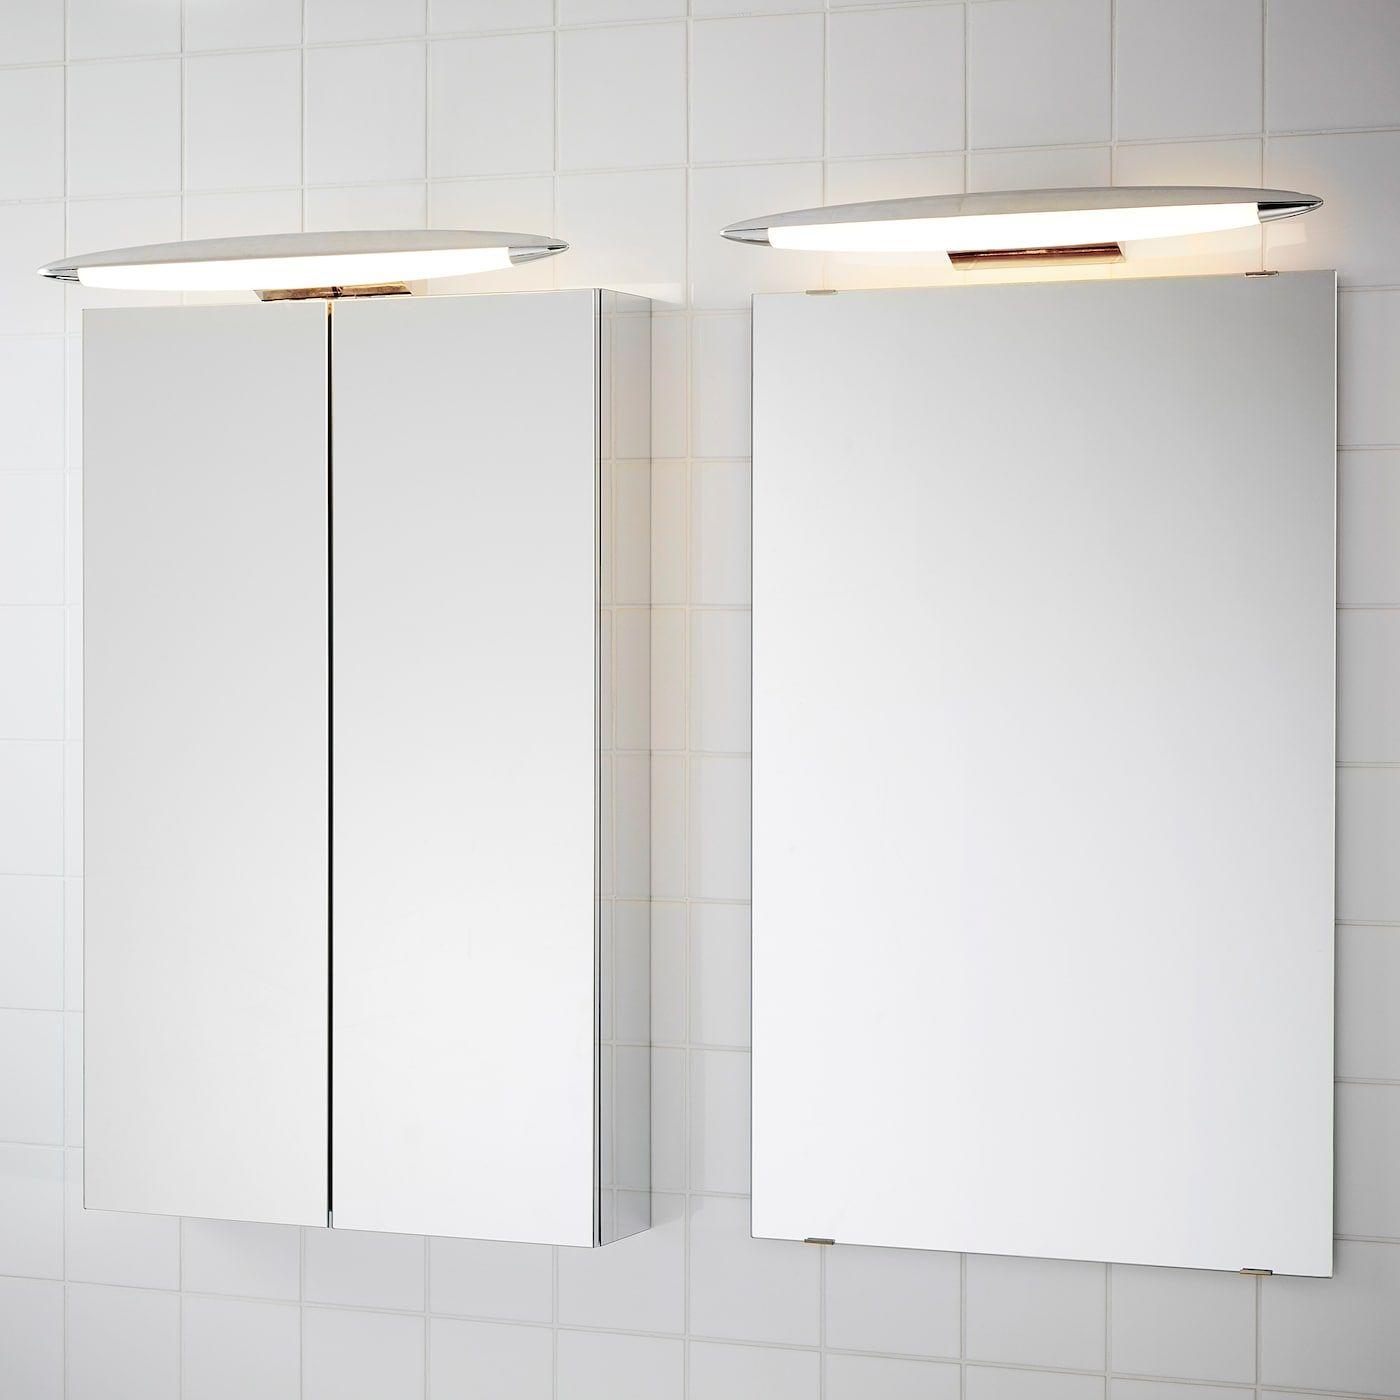 Skepp Led Cabinet Wall Light Ikea Ikea Bathroom Lighting Bathroom Light Fixtures Wall Lights